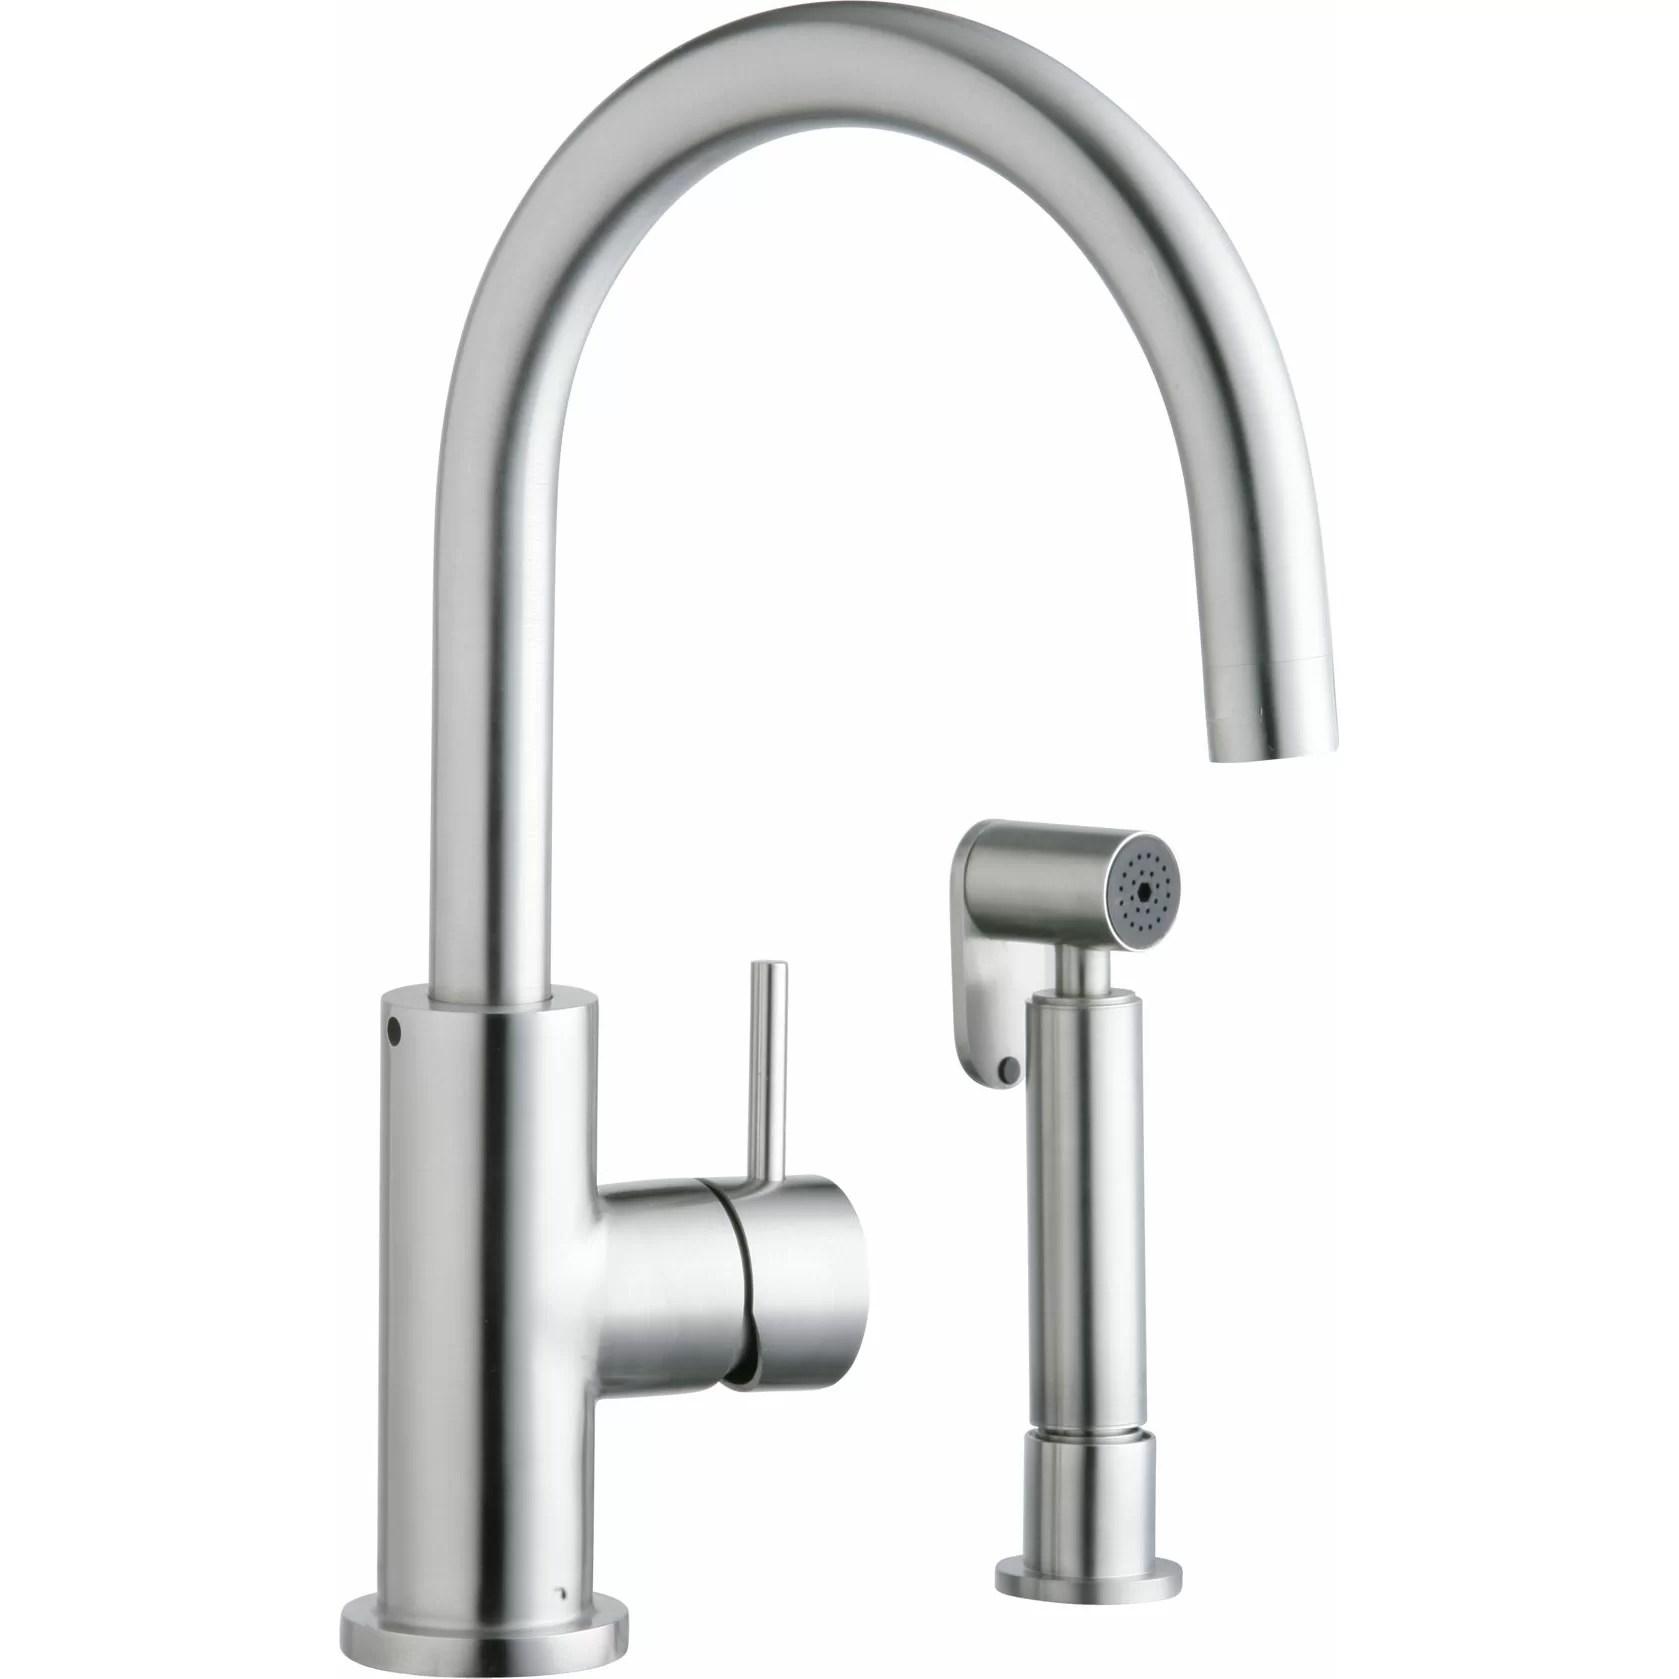 Elkay Allure Single Handle Deck Mount Kitchen Faucet